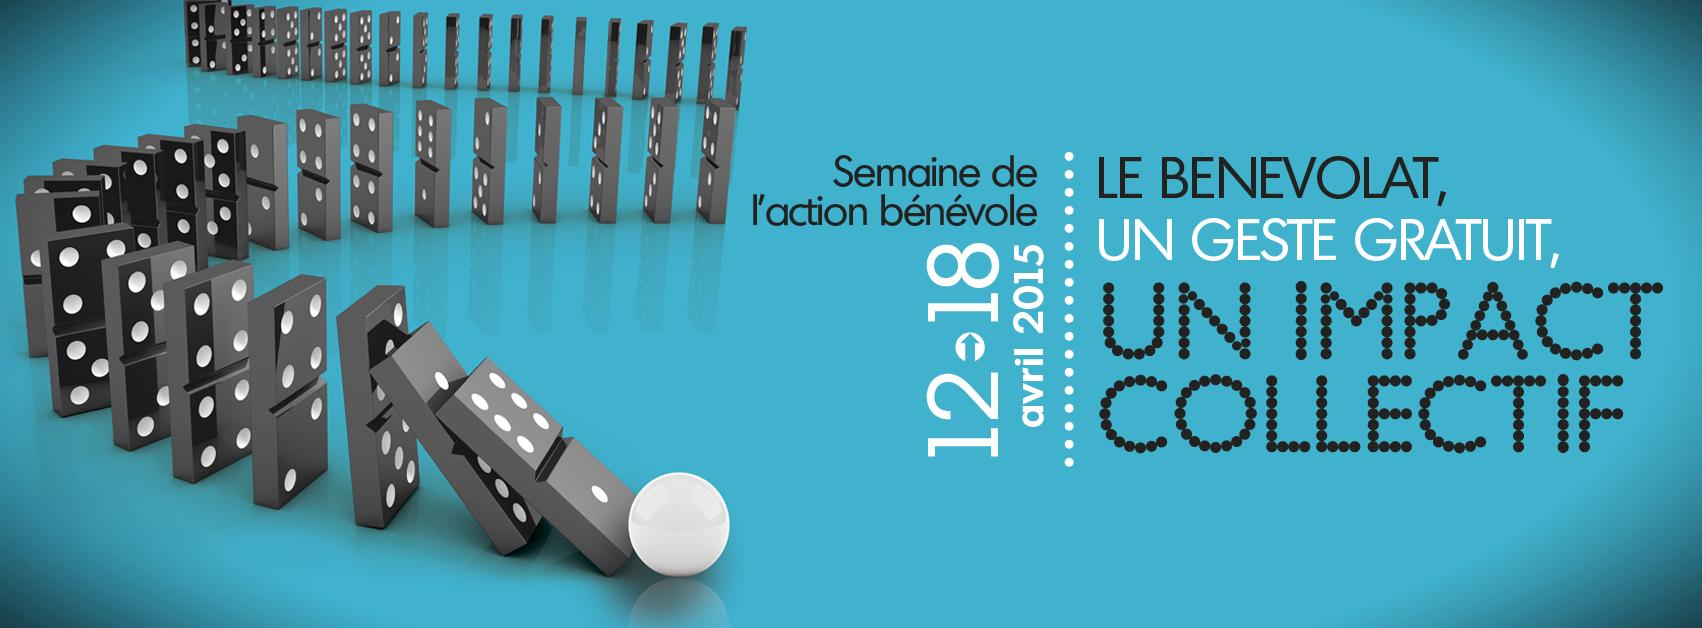 fcabq-Cover-Facebook_fr